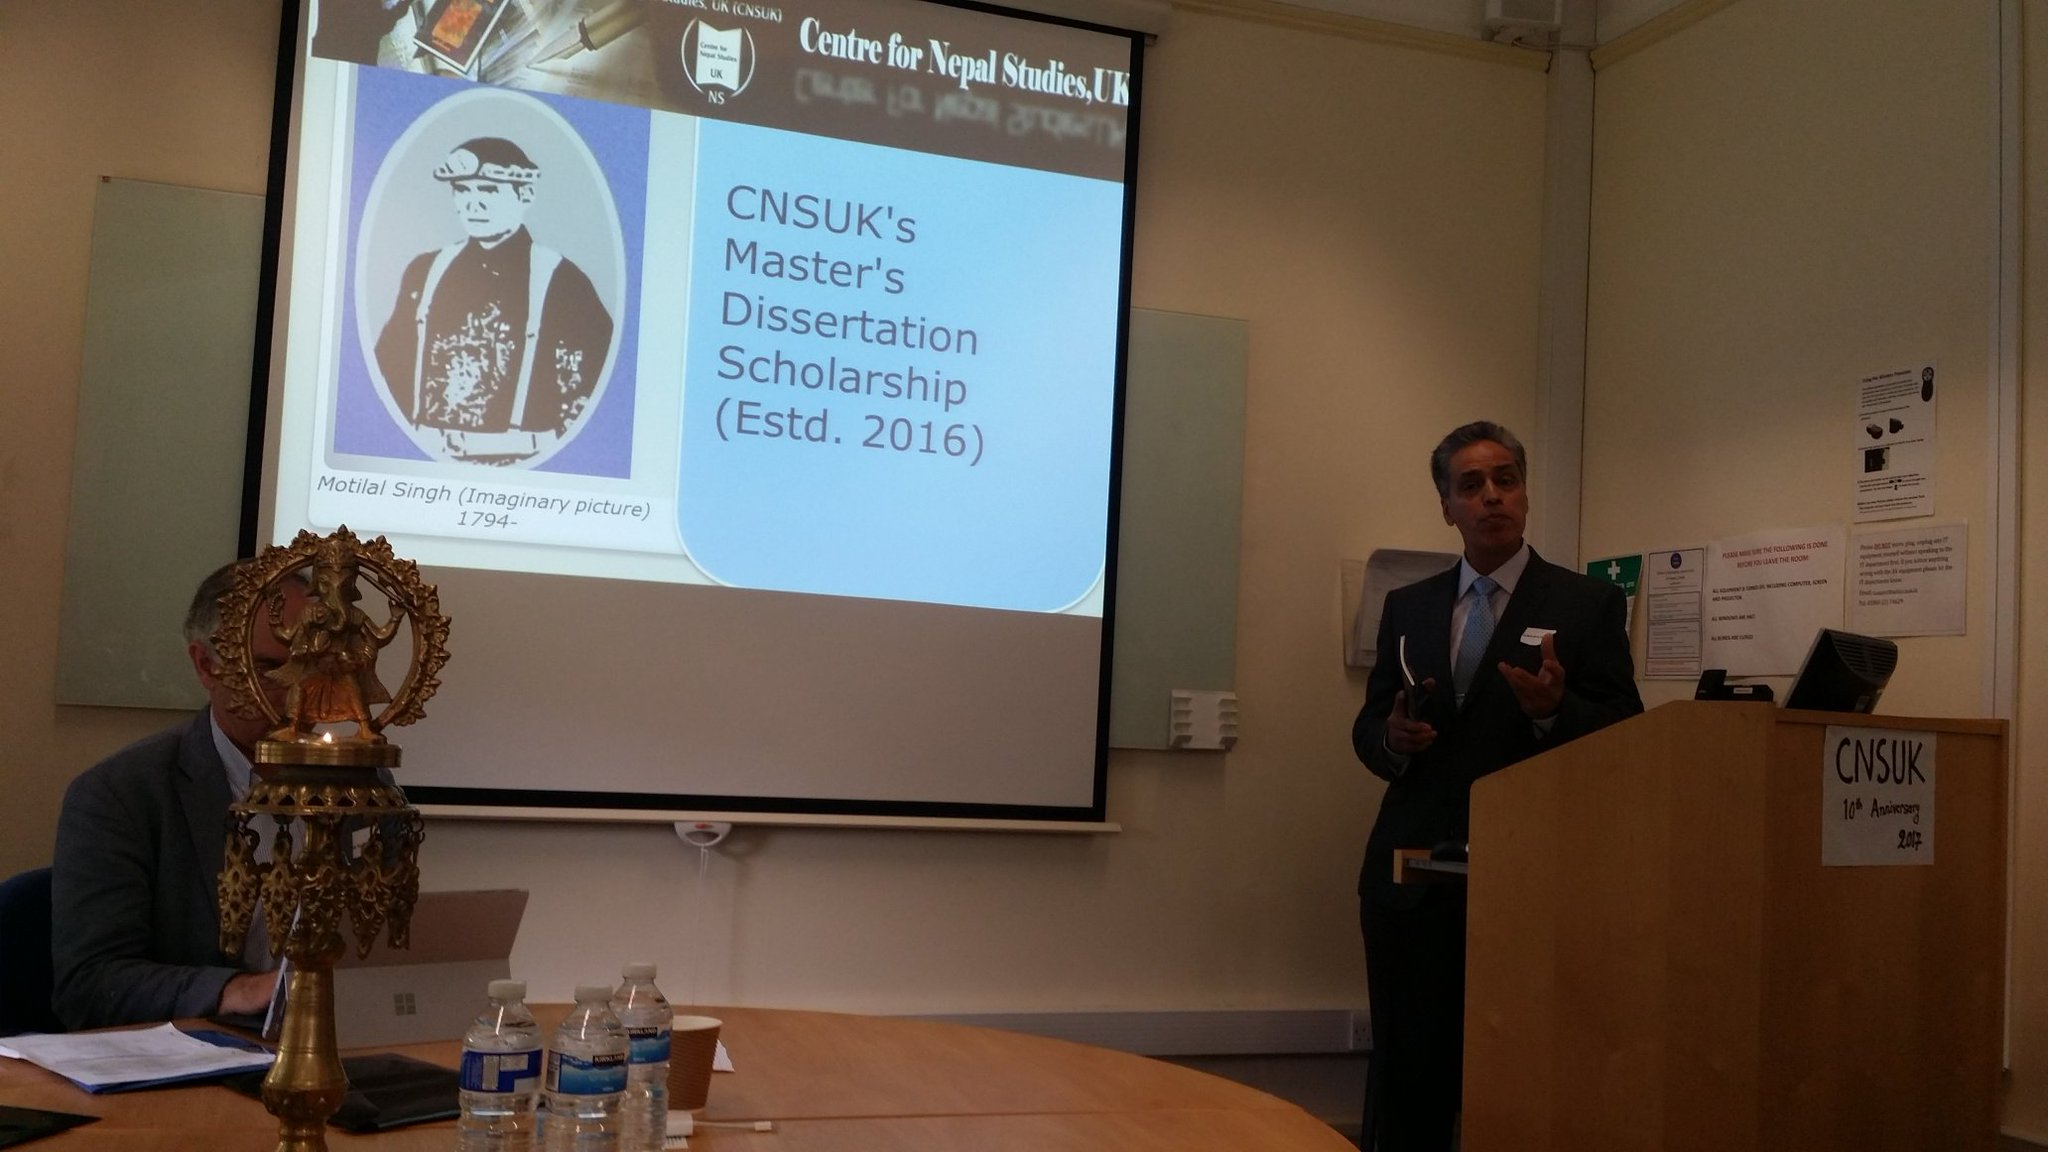 Lokendra Dhakal presenting on CNSUK Motilal scholarship #CNSUK10 https://t.co/EOWZwNzusn